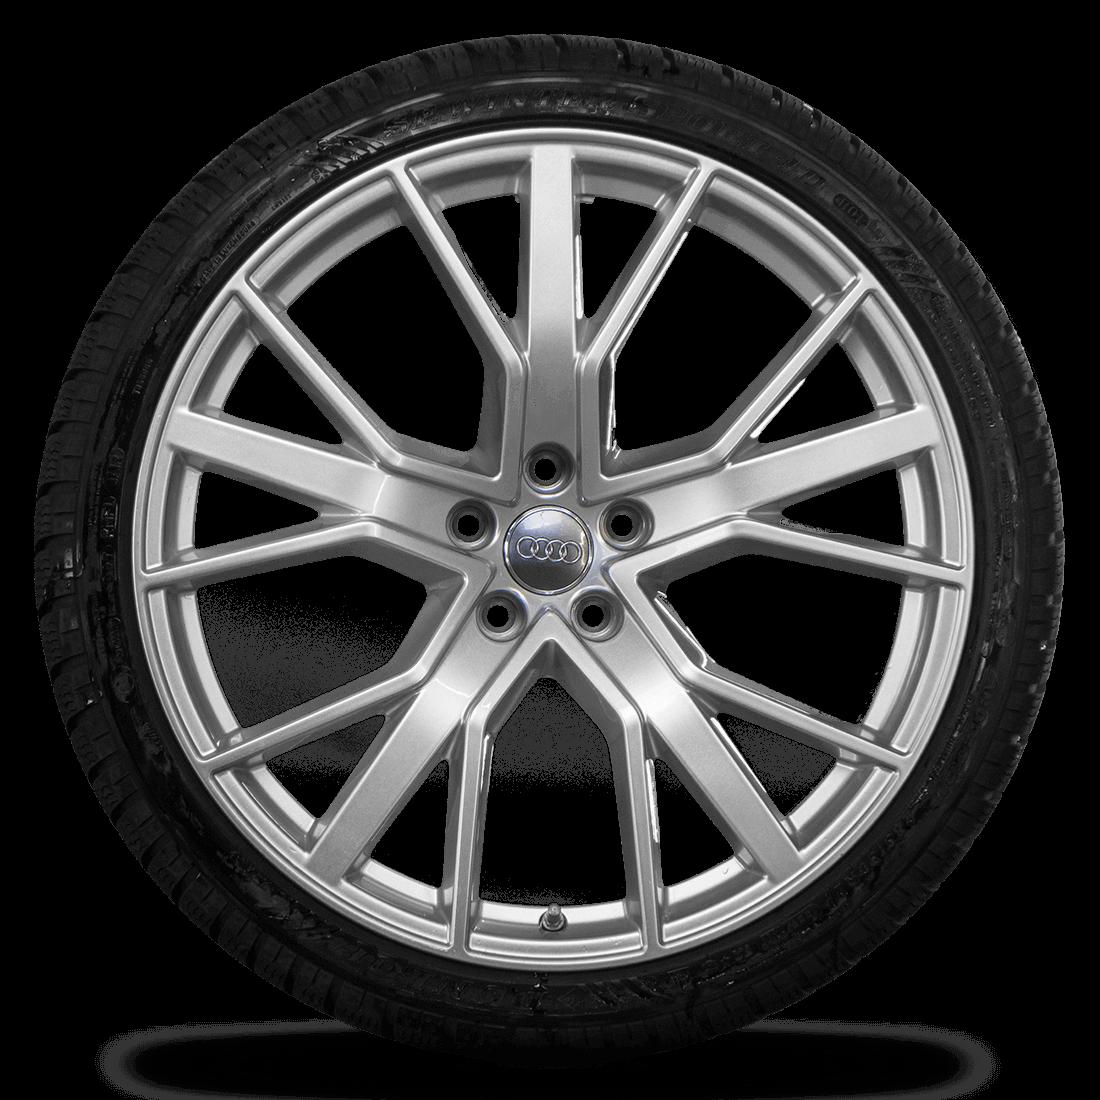 Audi 21 Zoll Felgen RS6 4G Performance Alufelgen Winterreifen Winterräder 7 mm